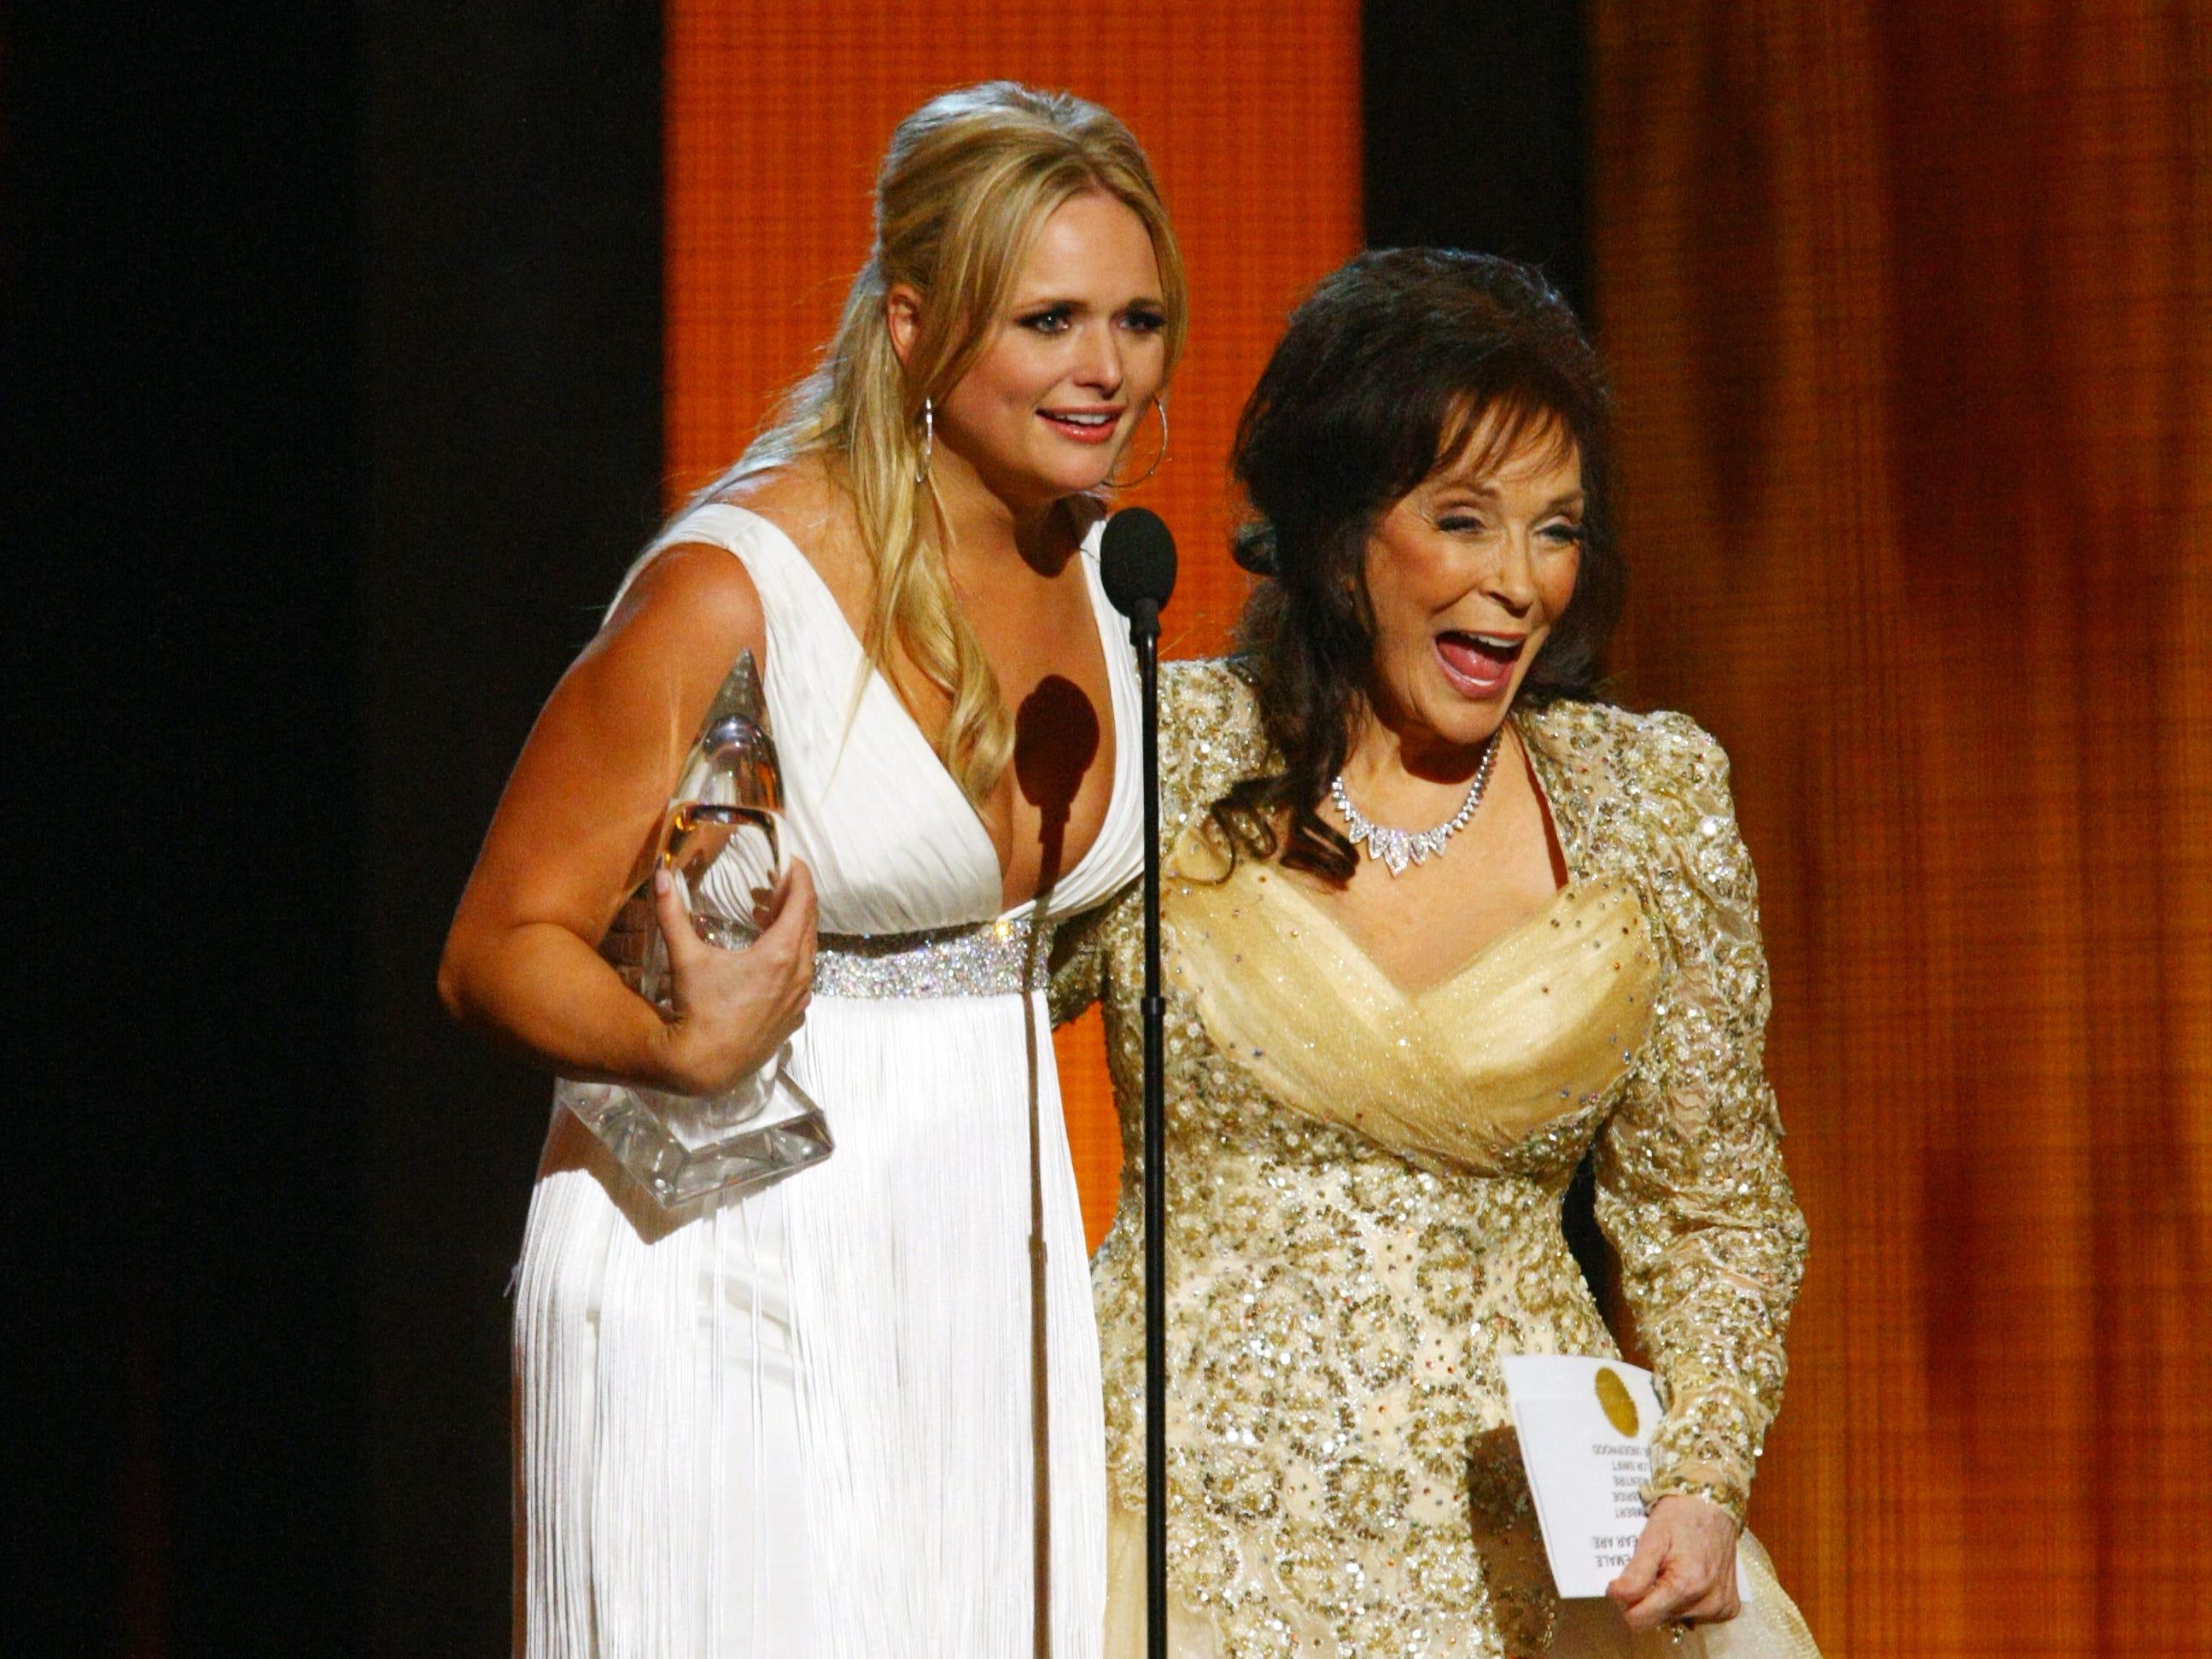 Miranda Lambert, left, accepts the award for Female Vocalist of the Year from Loretta Lynn at the 44th annual CMA Awards show Nov. 10th, 2010, at Bridgestone Arena.